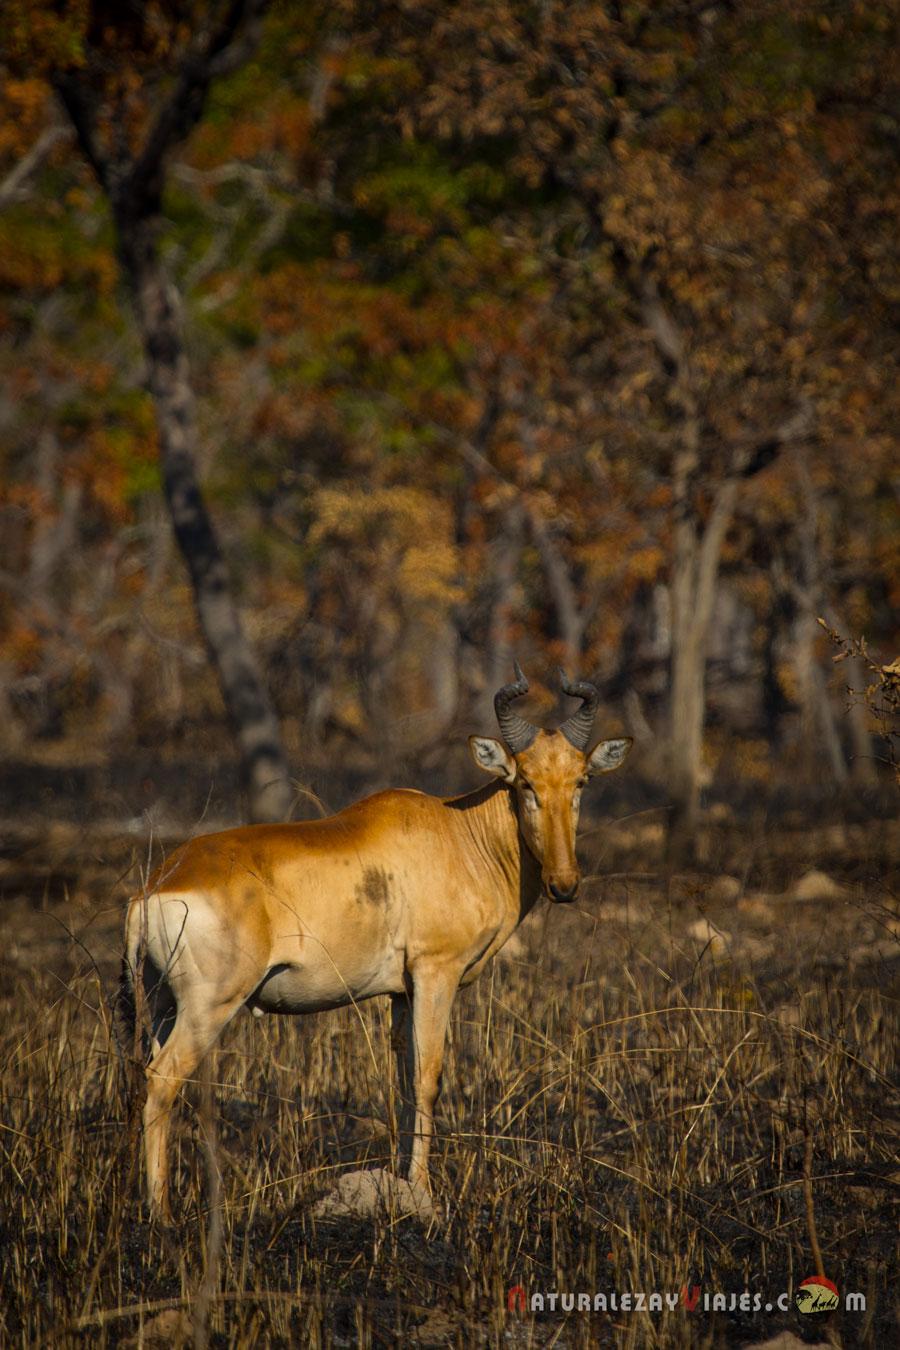 Alcéfalo en Kafue, Zambia